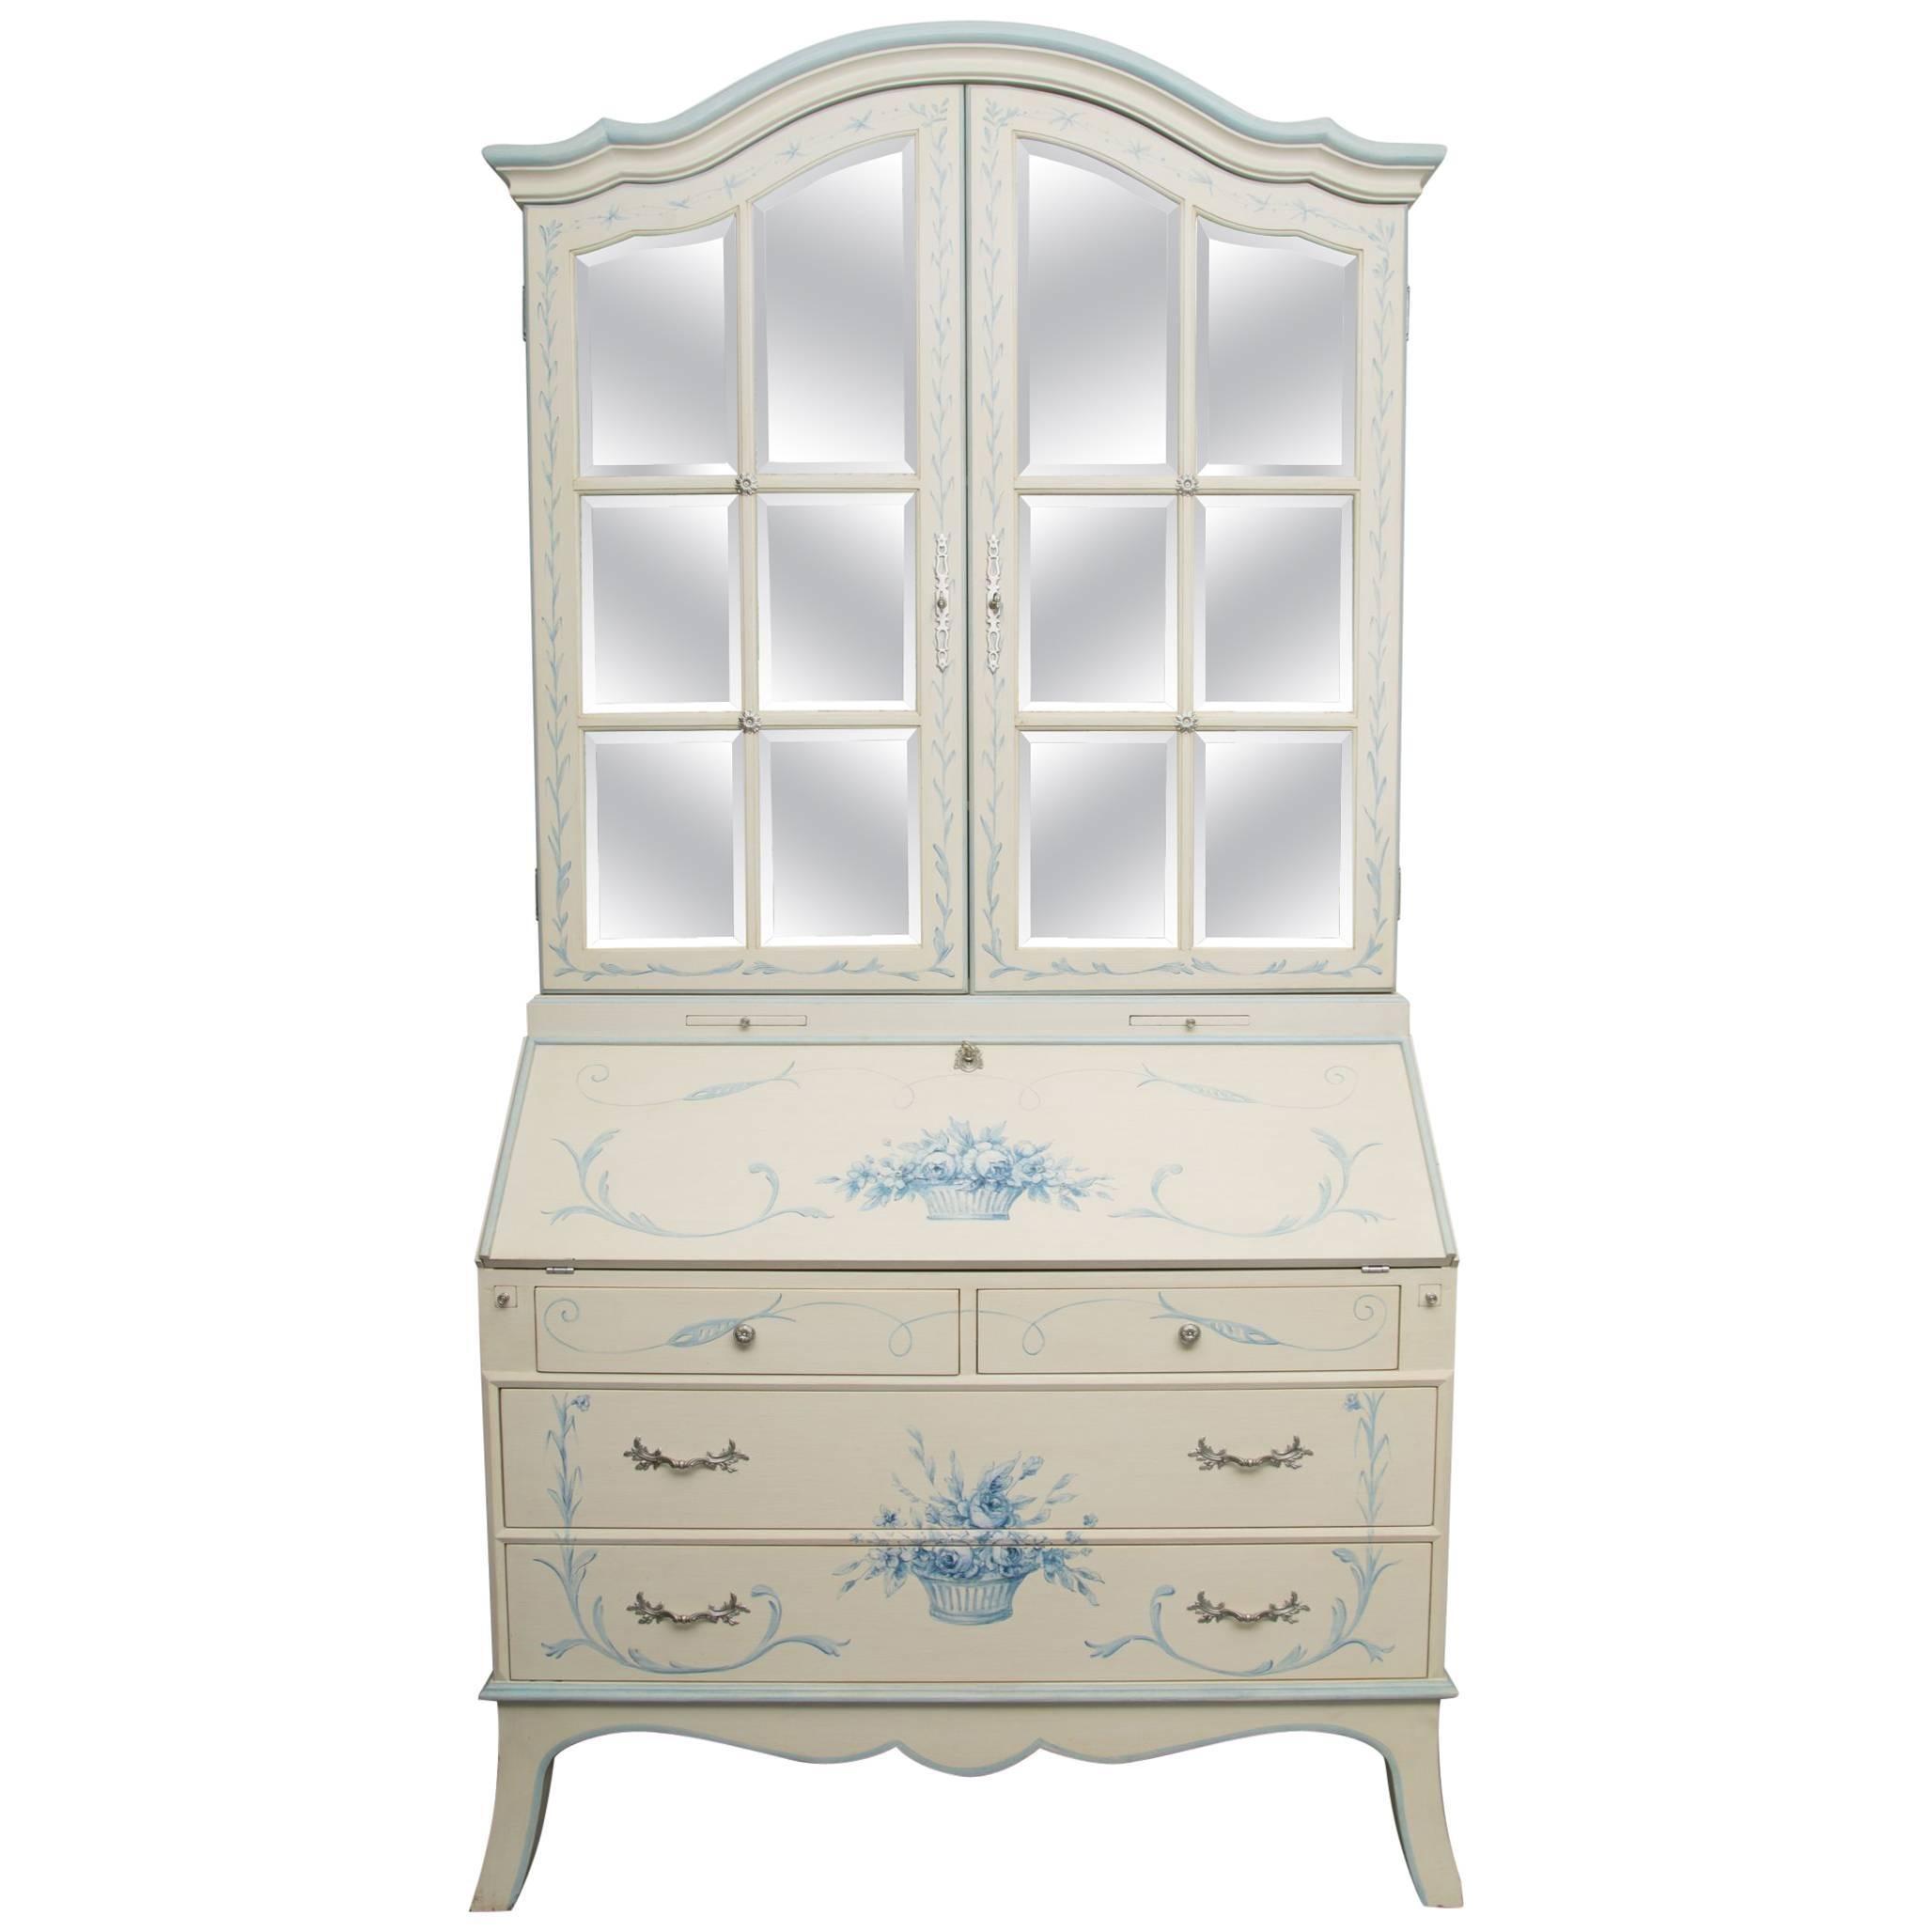 Custom Hand-Painted Secretary Desk with Mirrored Doors